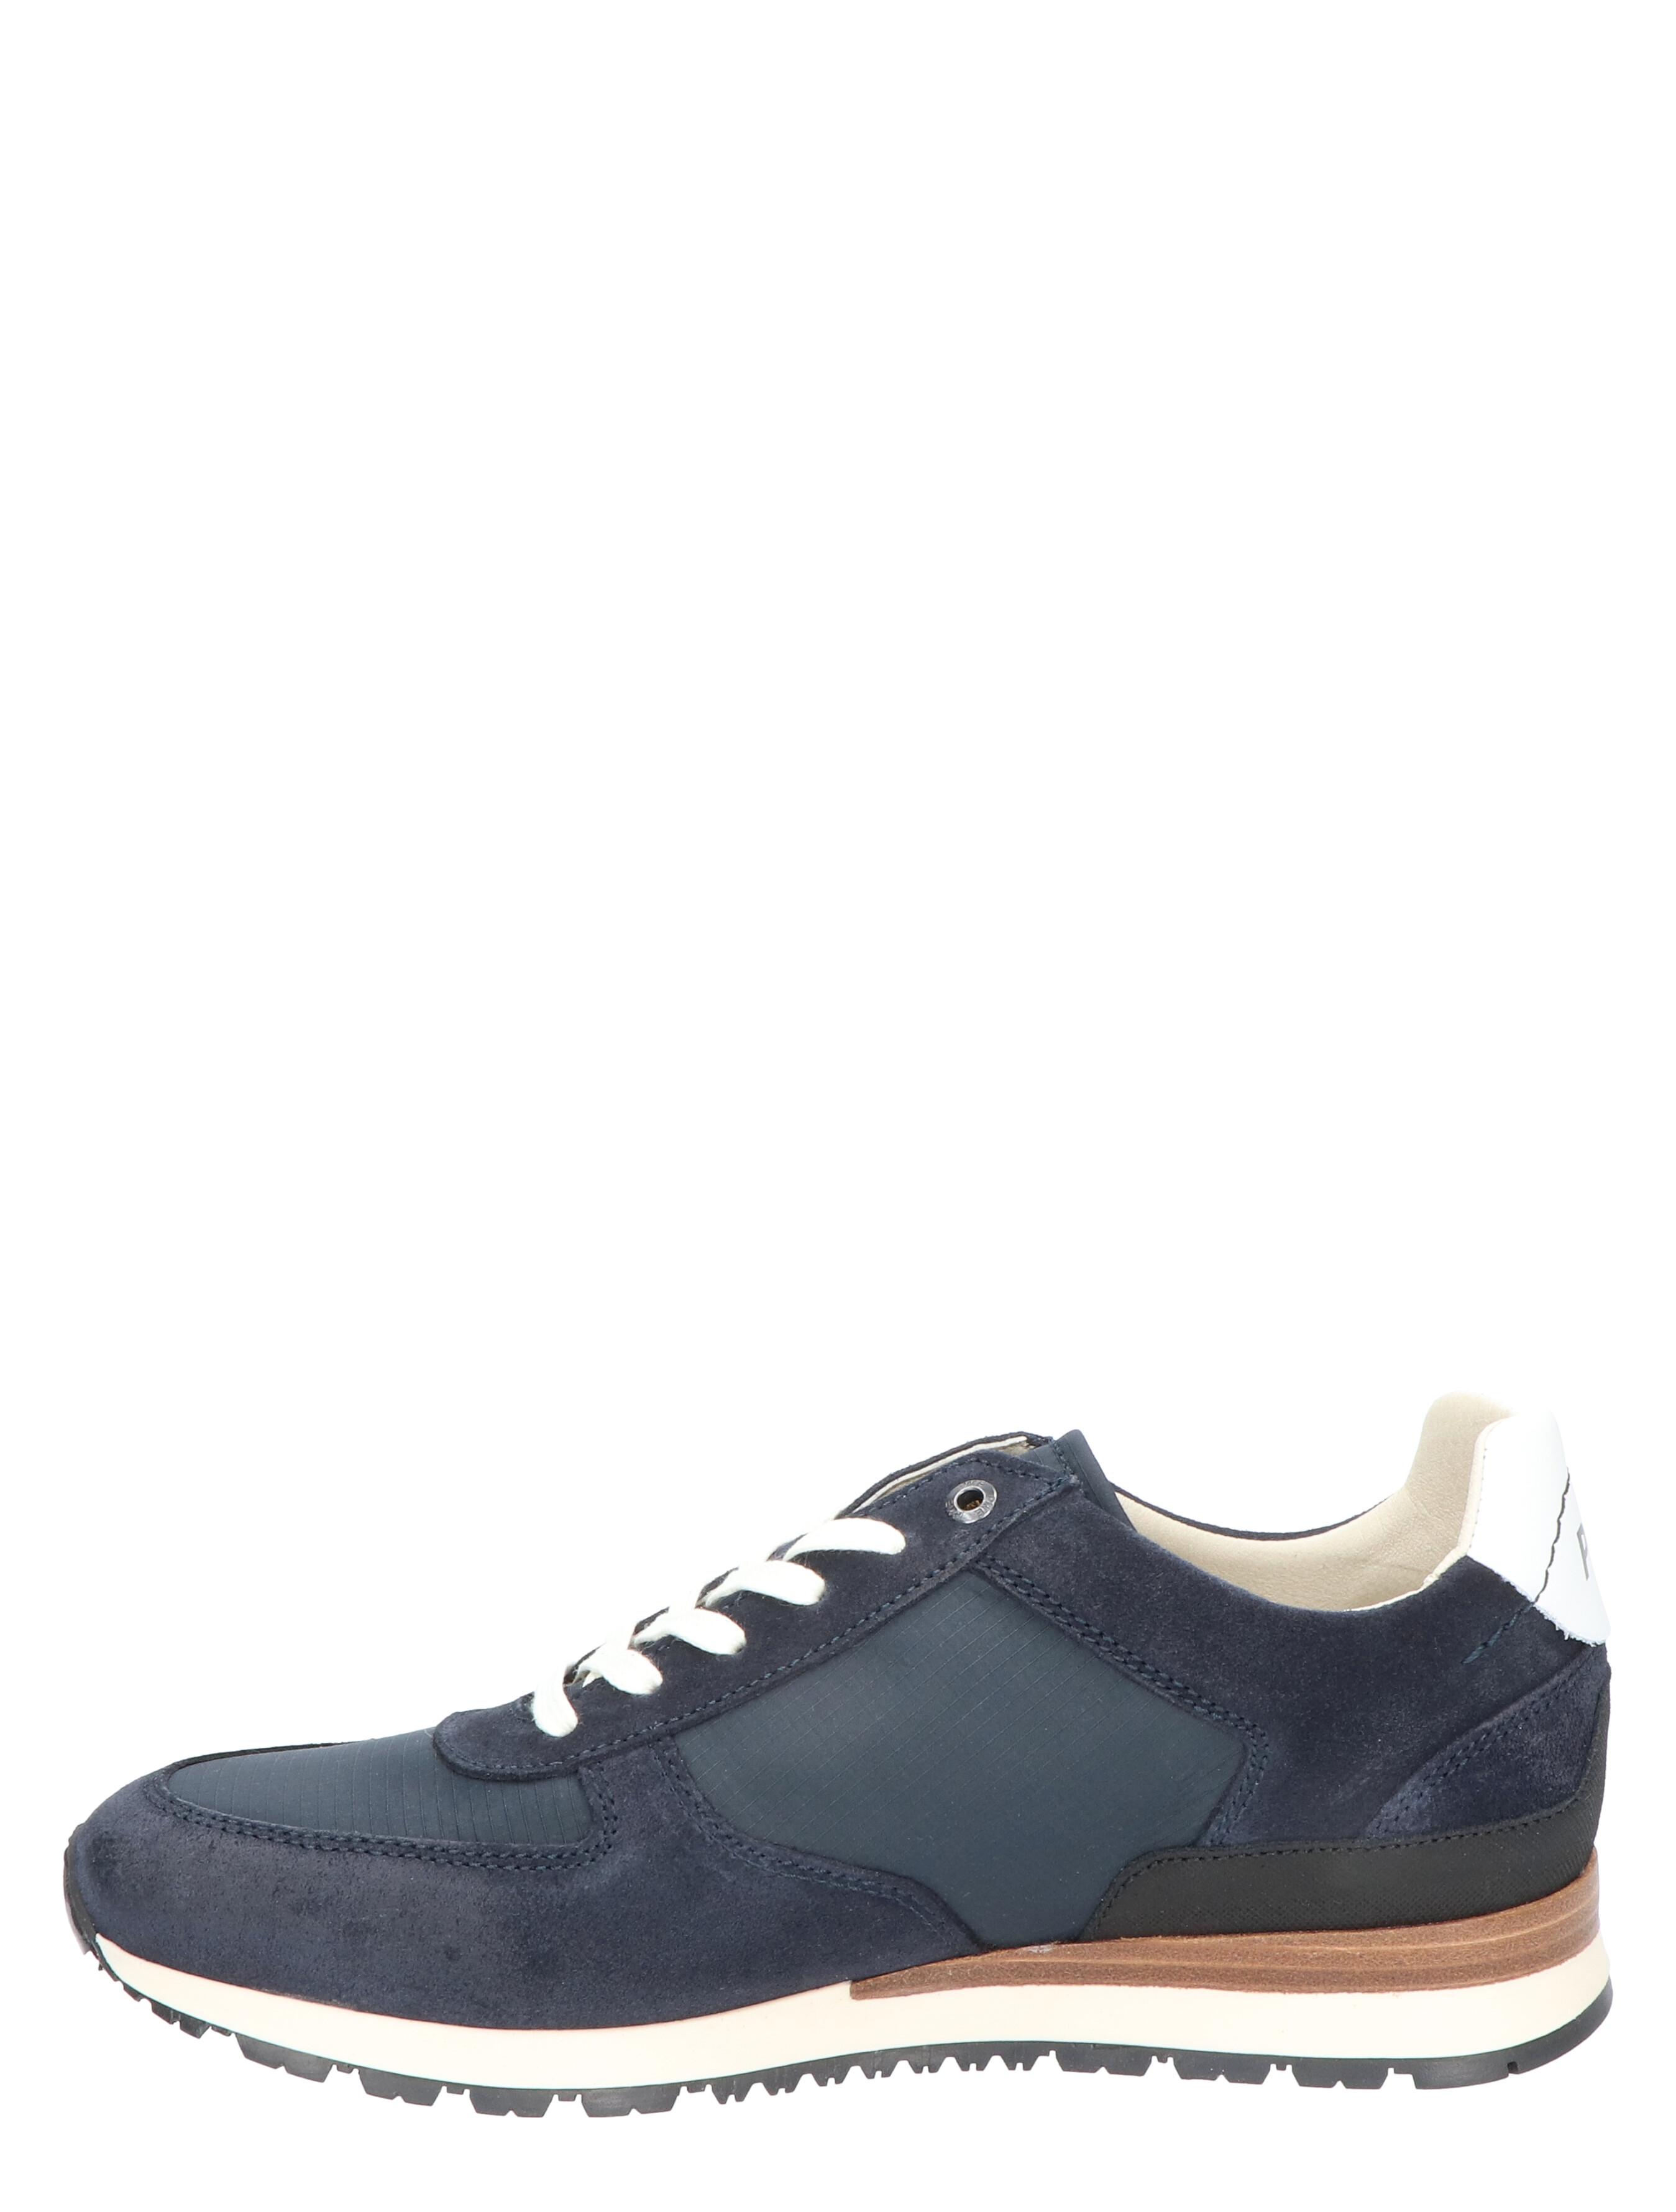 Pme Legend Lockplate Navy Sneakers